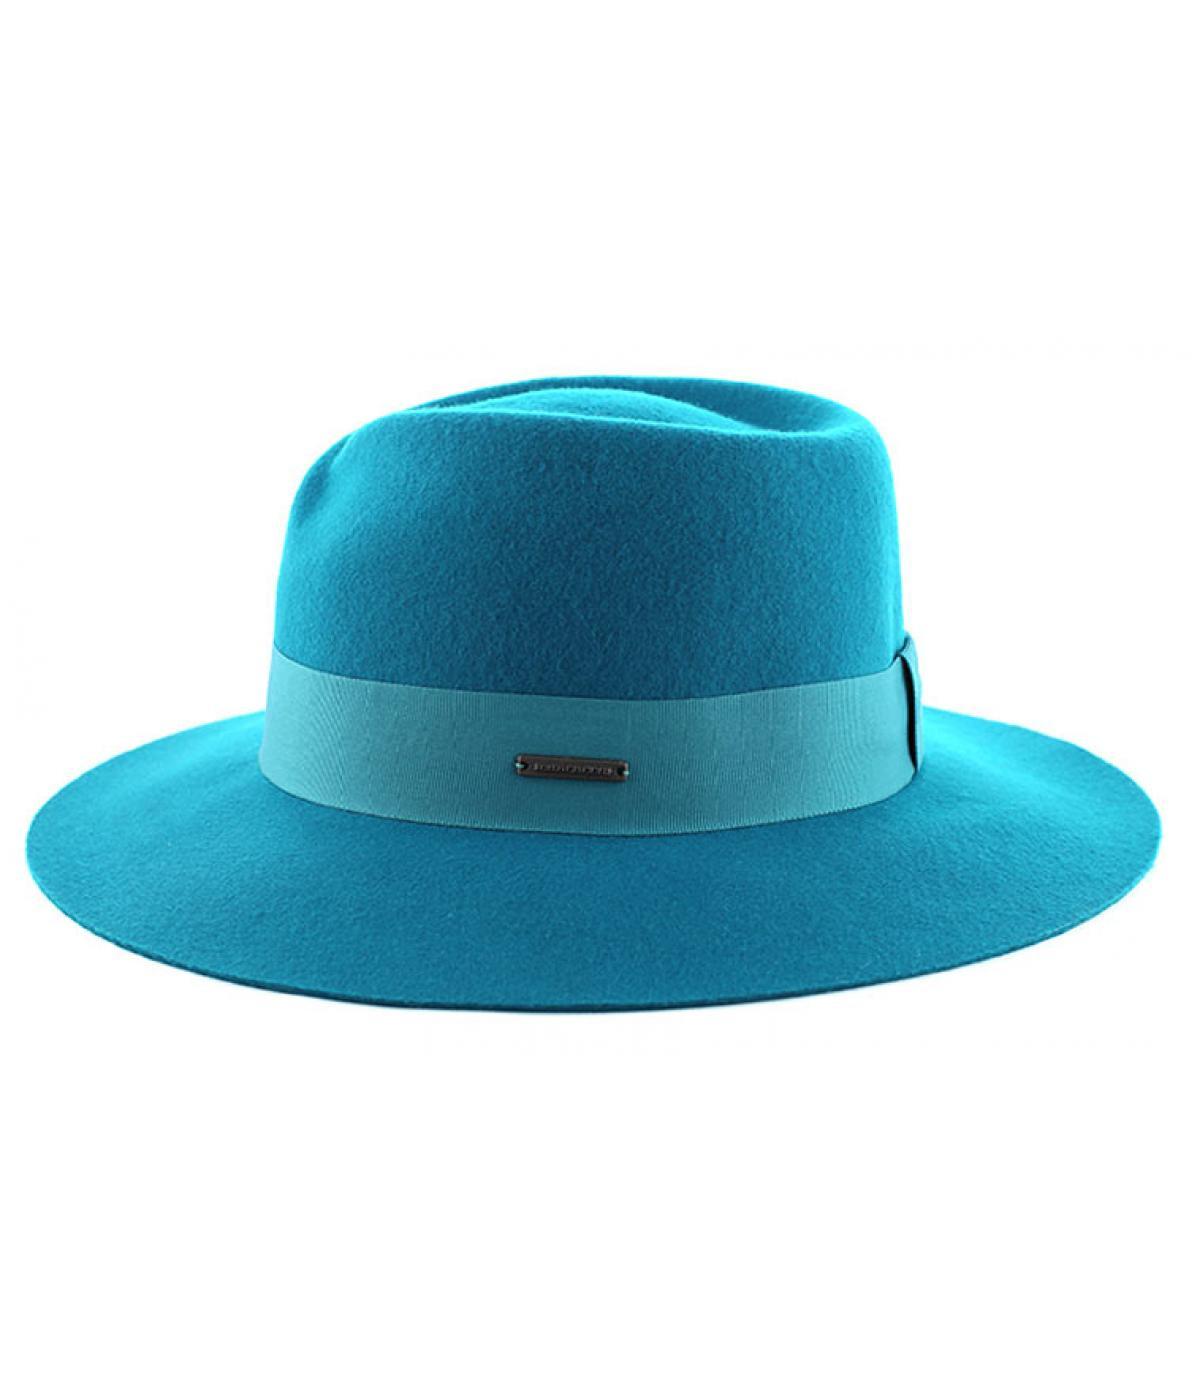 Chapeau femme fedora bleu